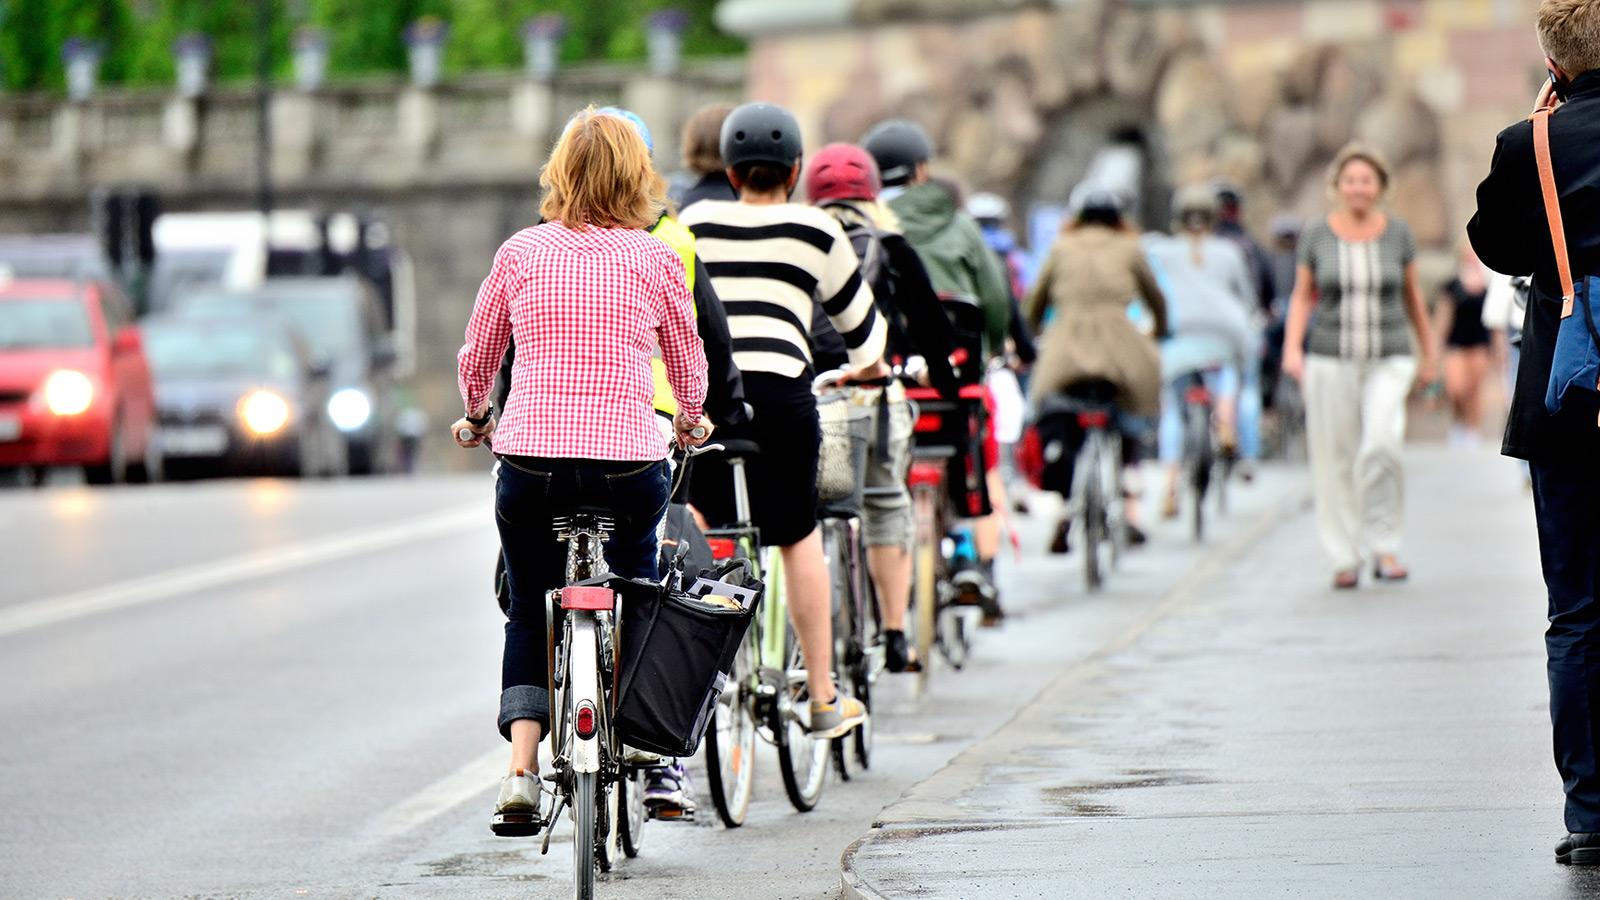 Bikes in bike lane